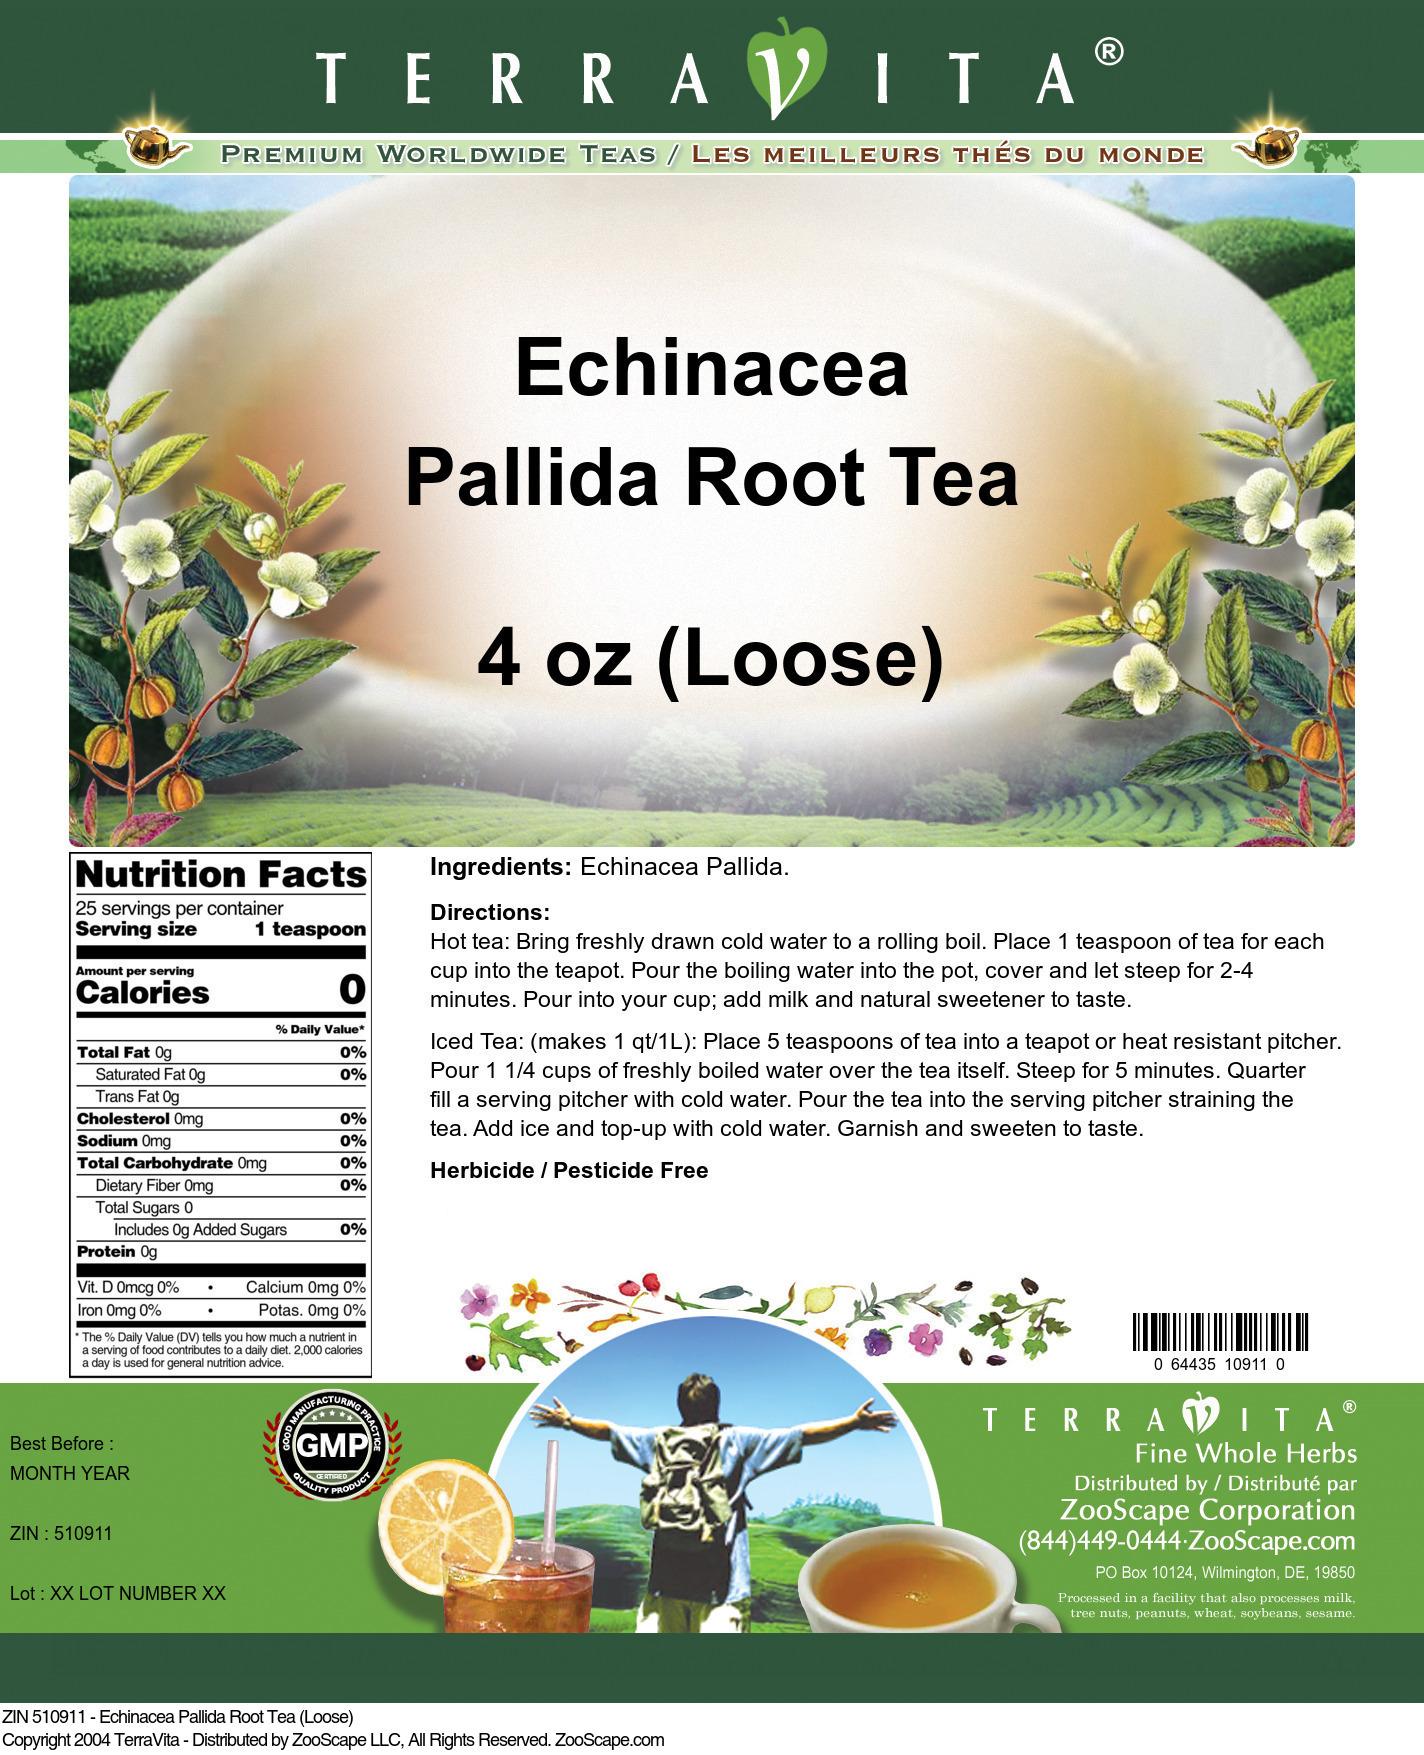 Echinacea Pallida Root Tea (Loose)